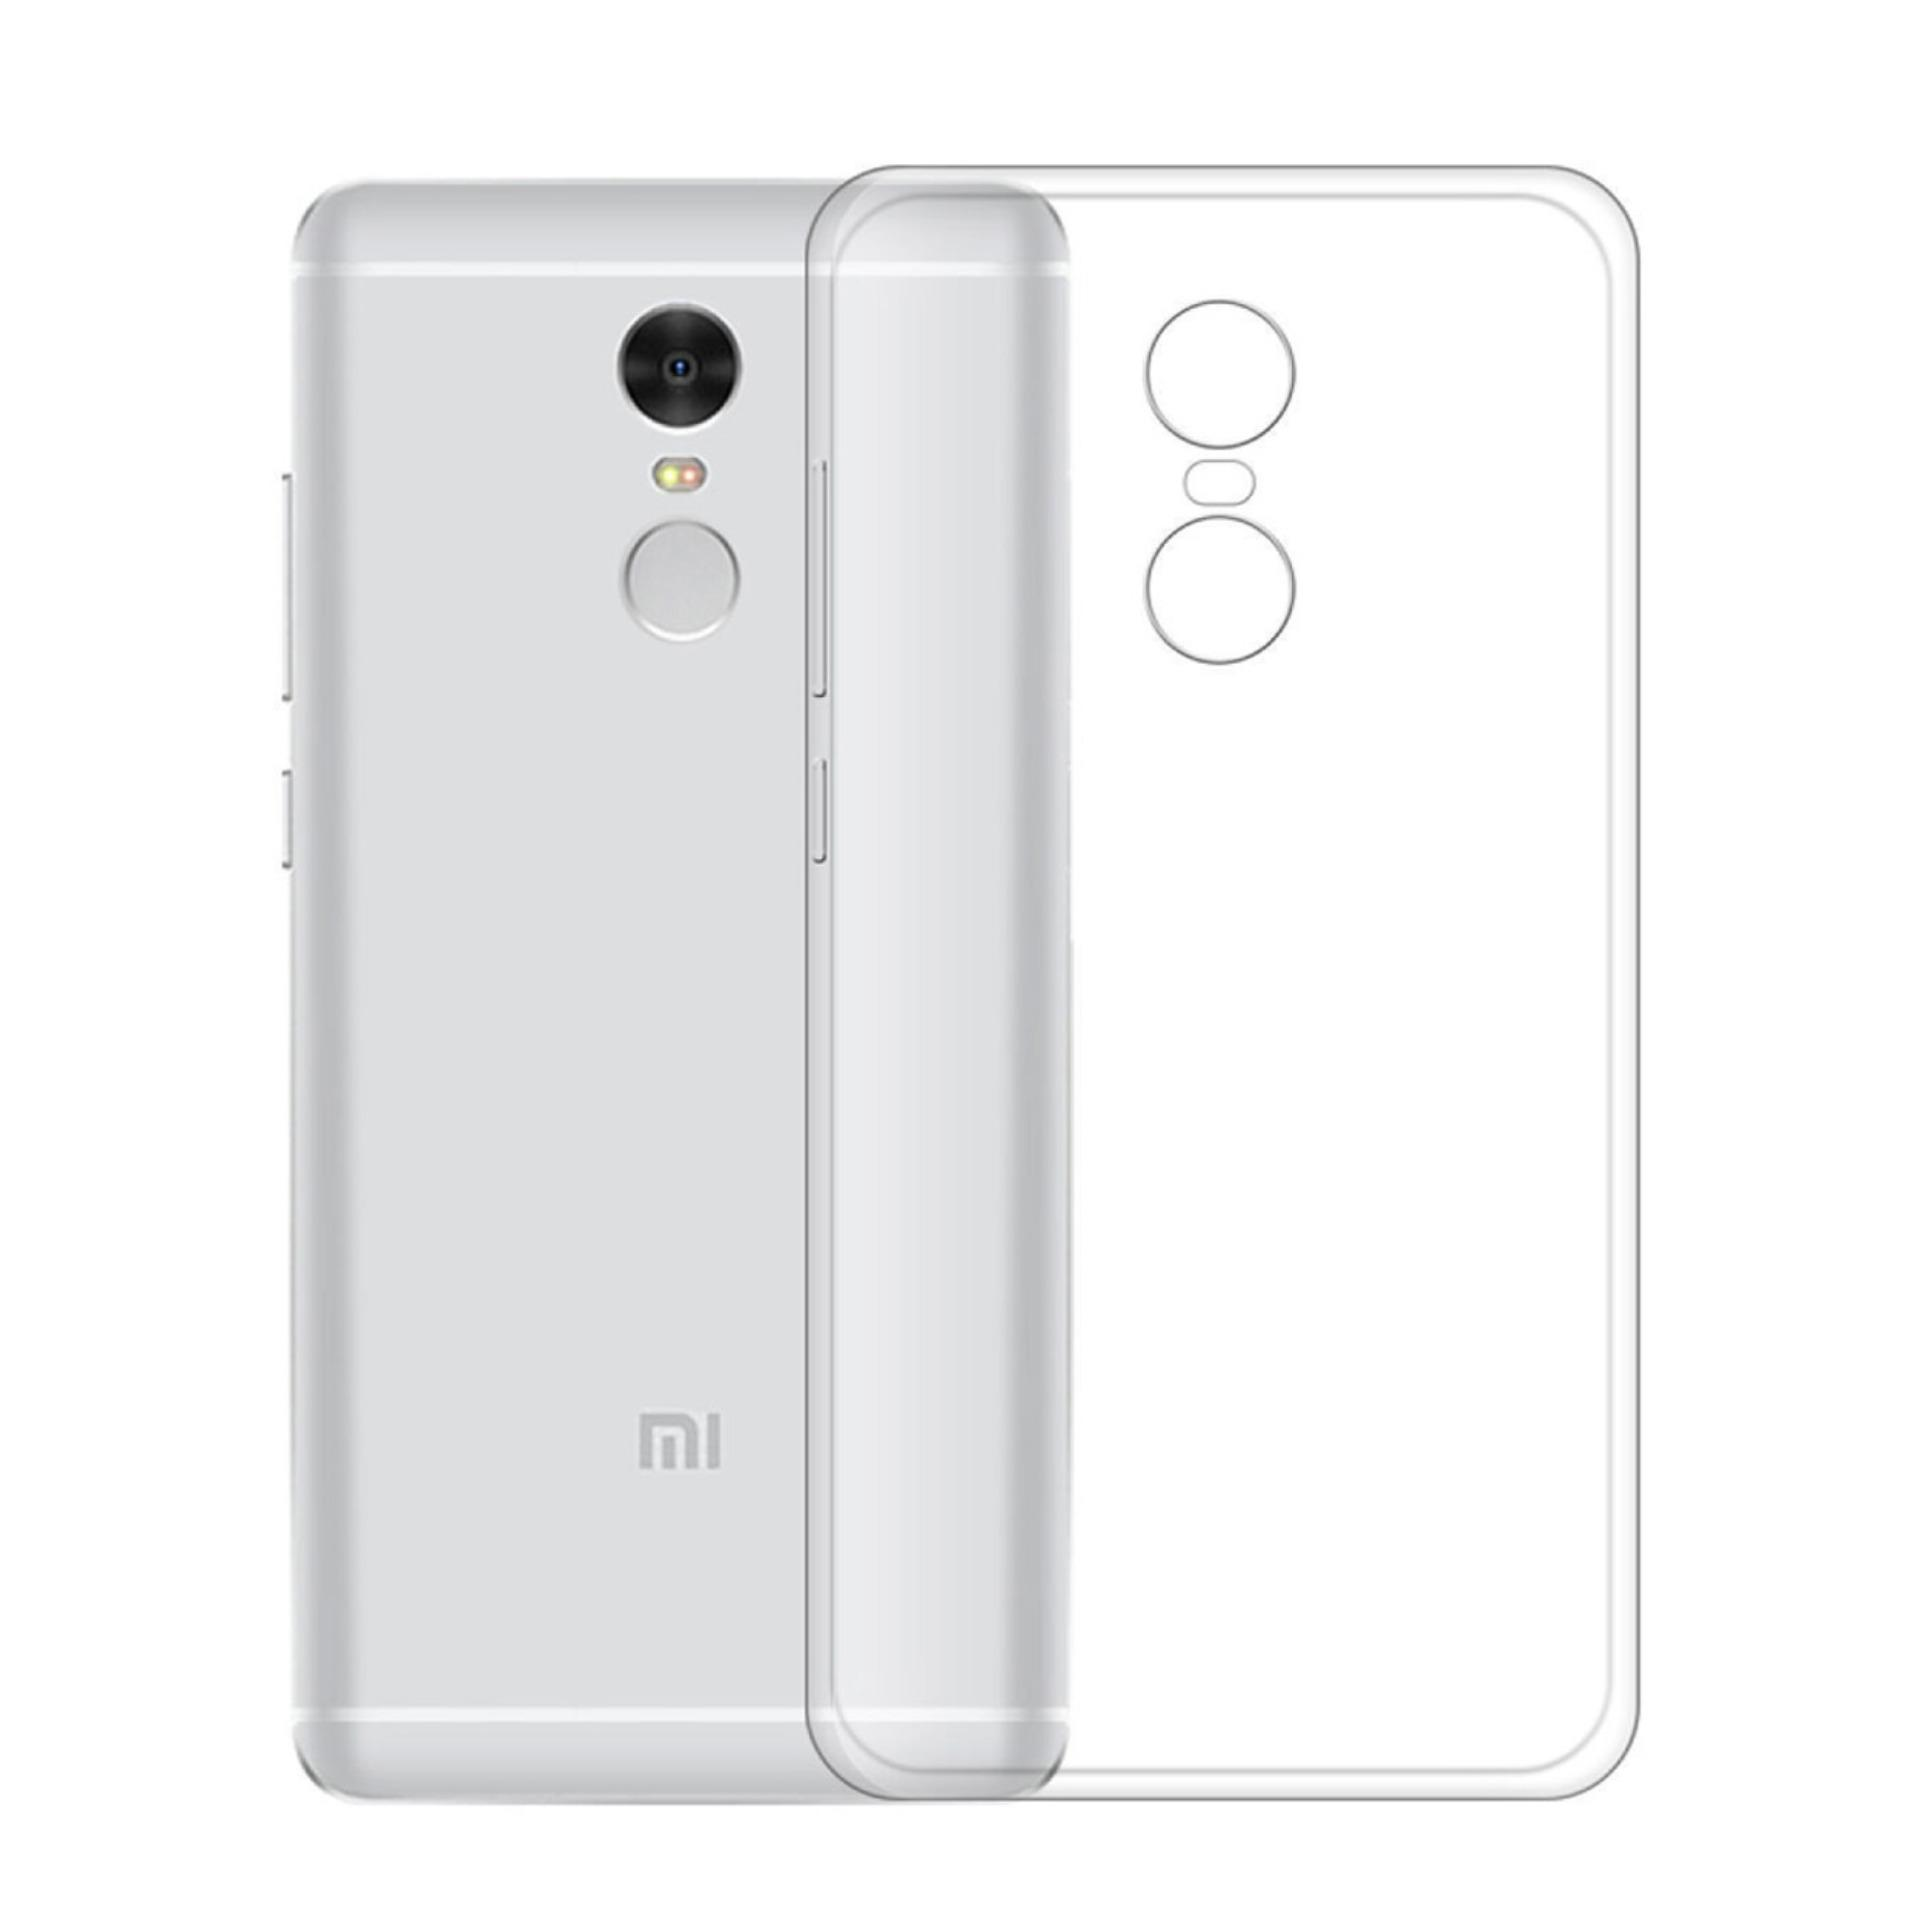 Ultra Thin Soft Silicone Case for Xiaomi Redmi Note 4x (Clear)